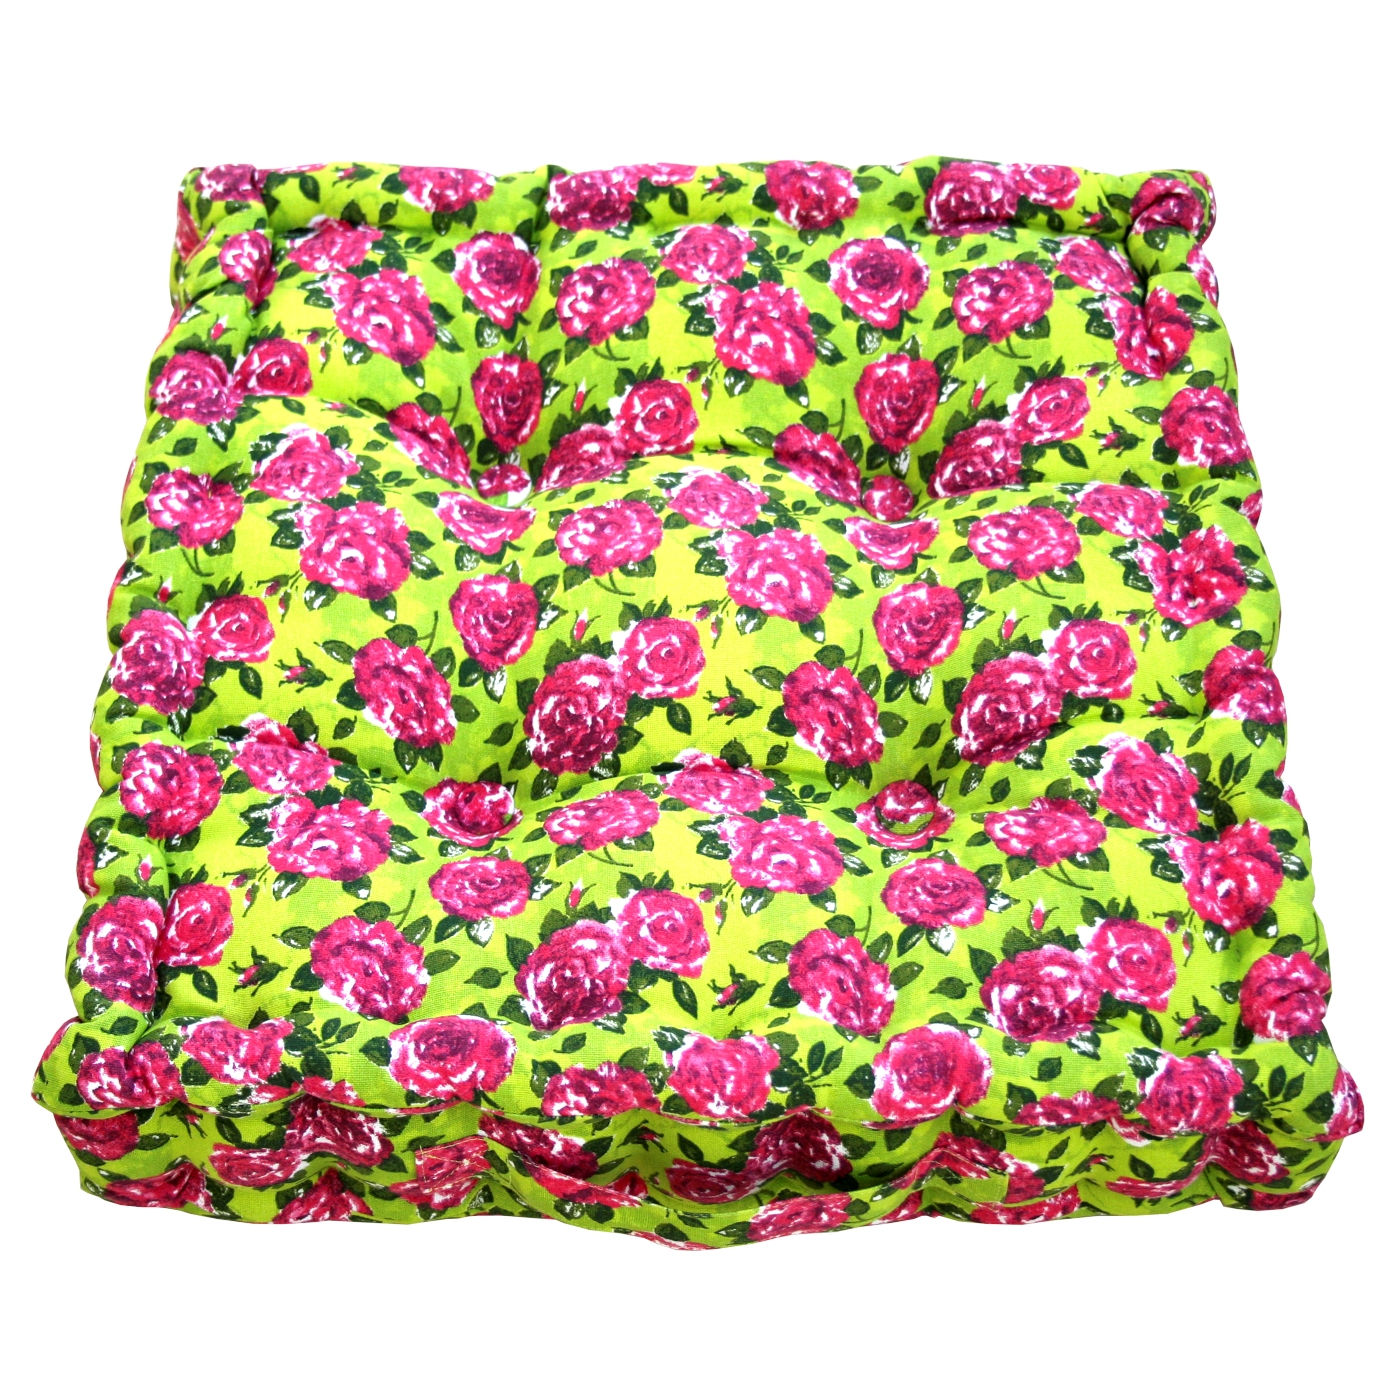 Rose & Lime Garden Cushion~ €43.00